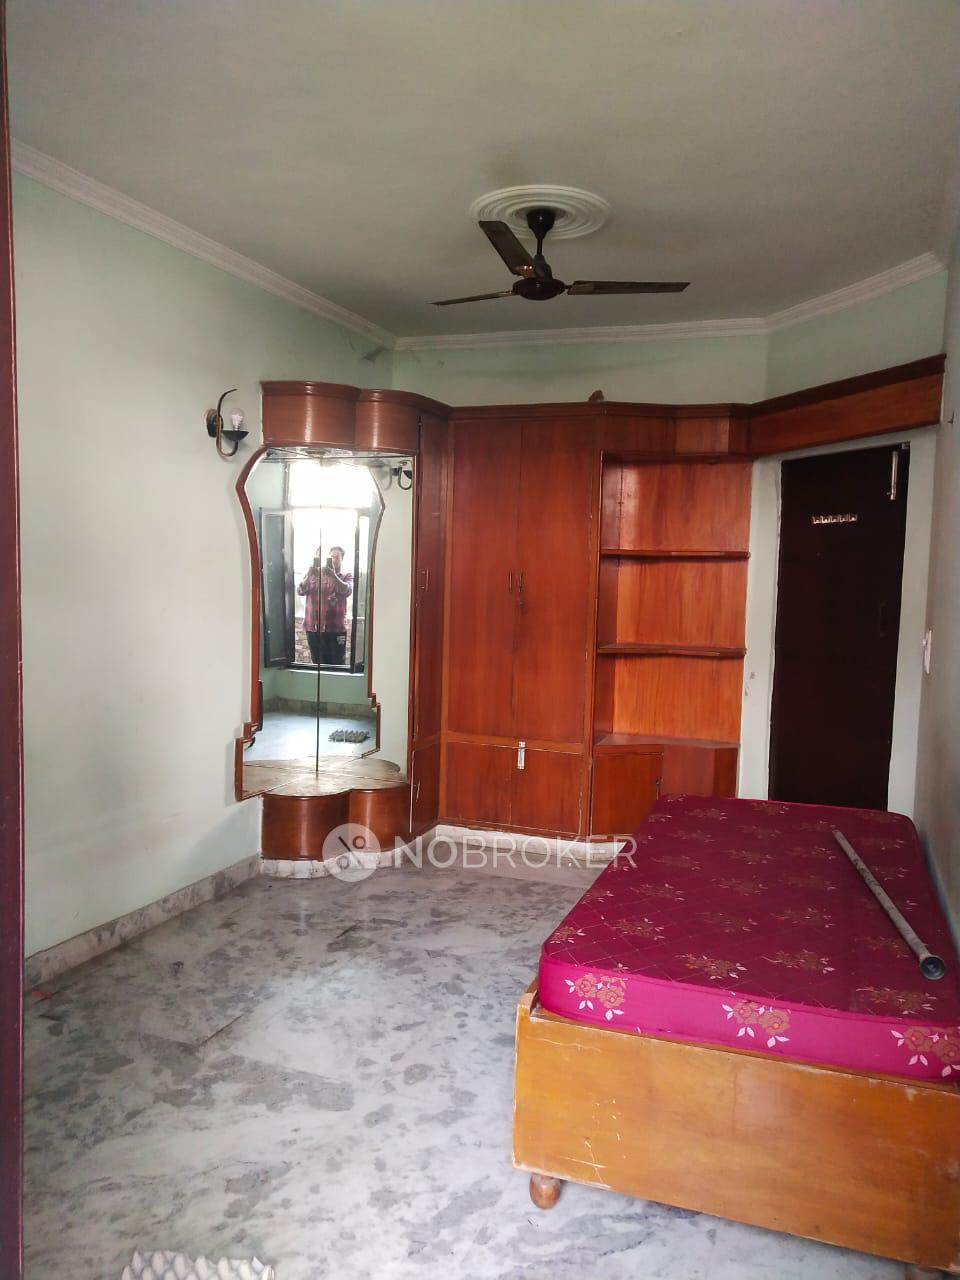 2BHK Flat for rent in Chanderlok, DLF City IV, Sector 28, Gurgaon